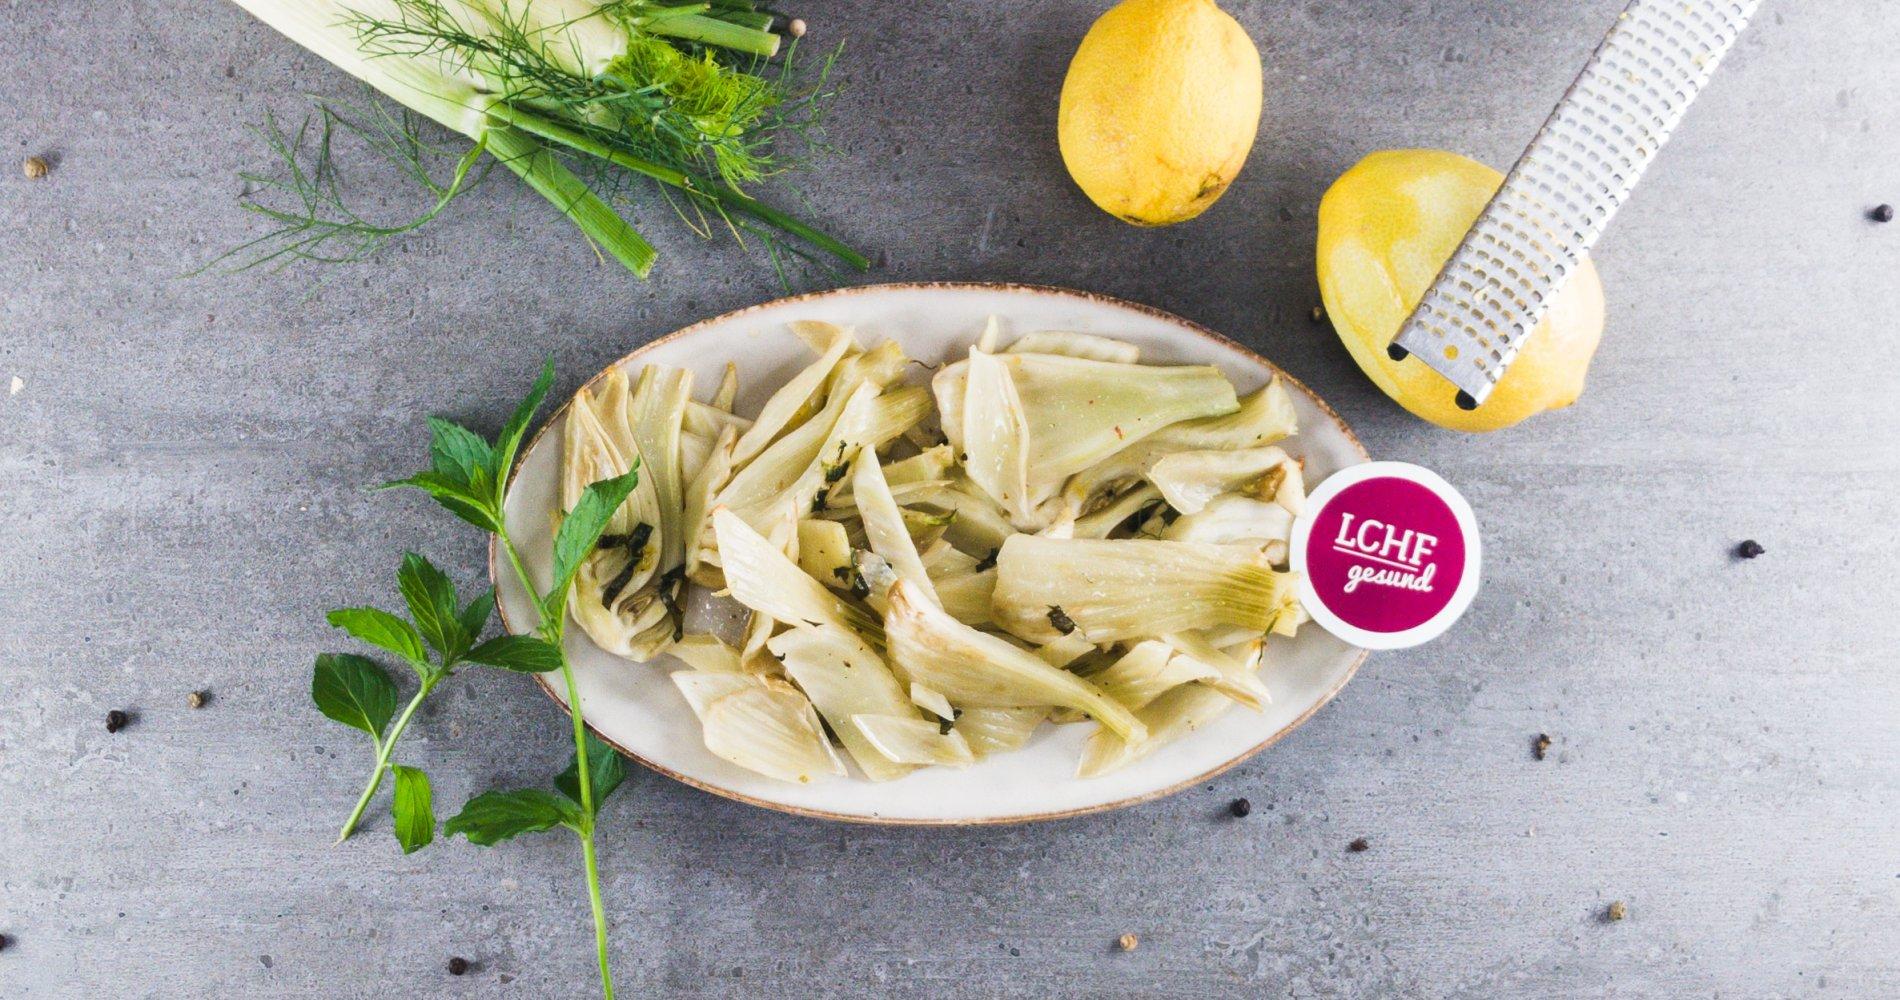 Rezept Low Carb: Zitroniges Fenchelgemüse - LCHF-gesund.de